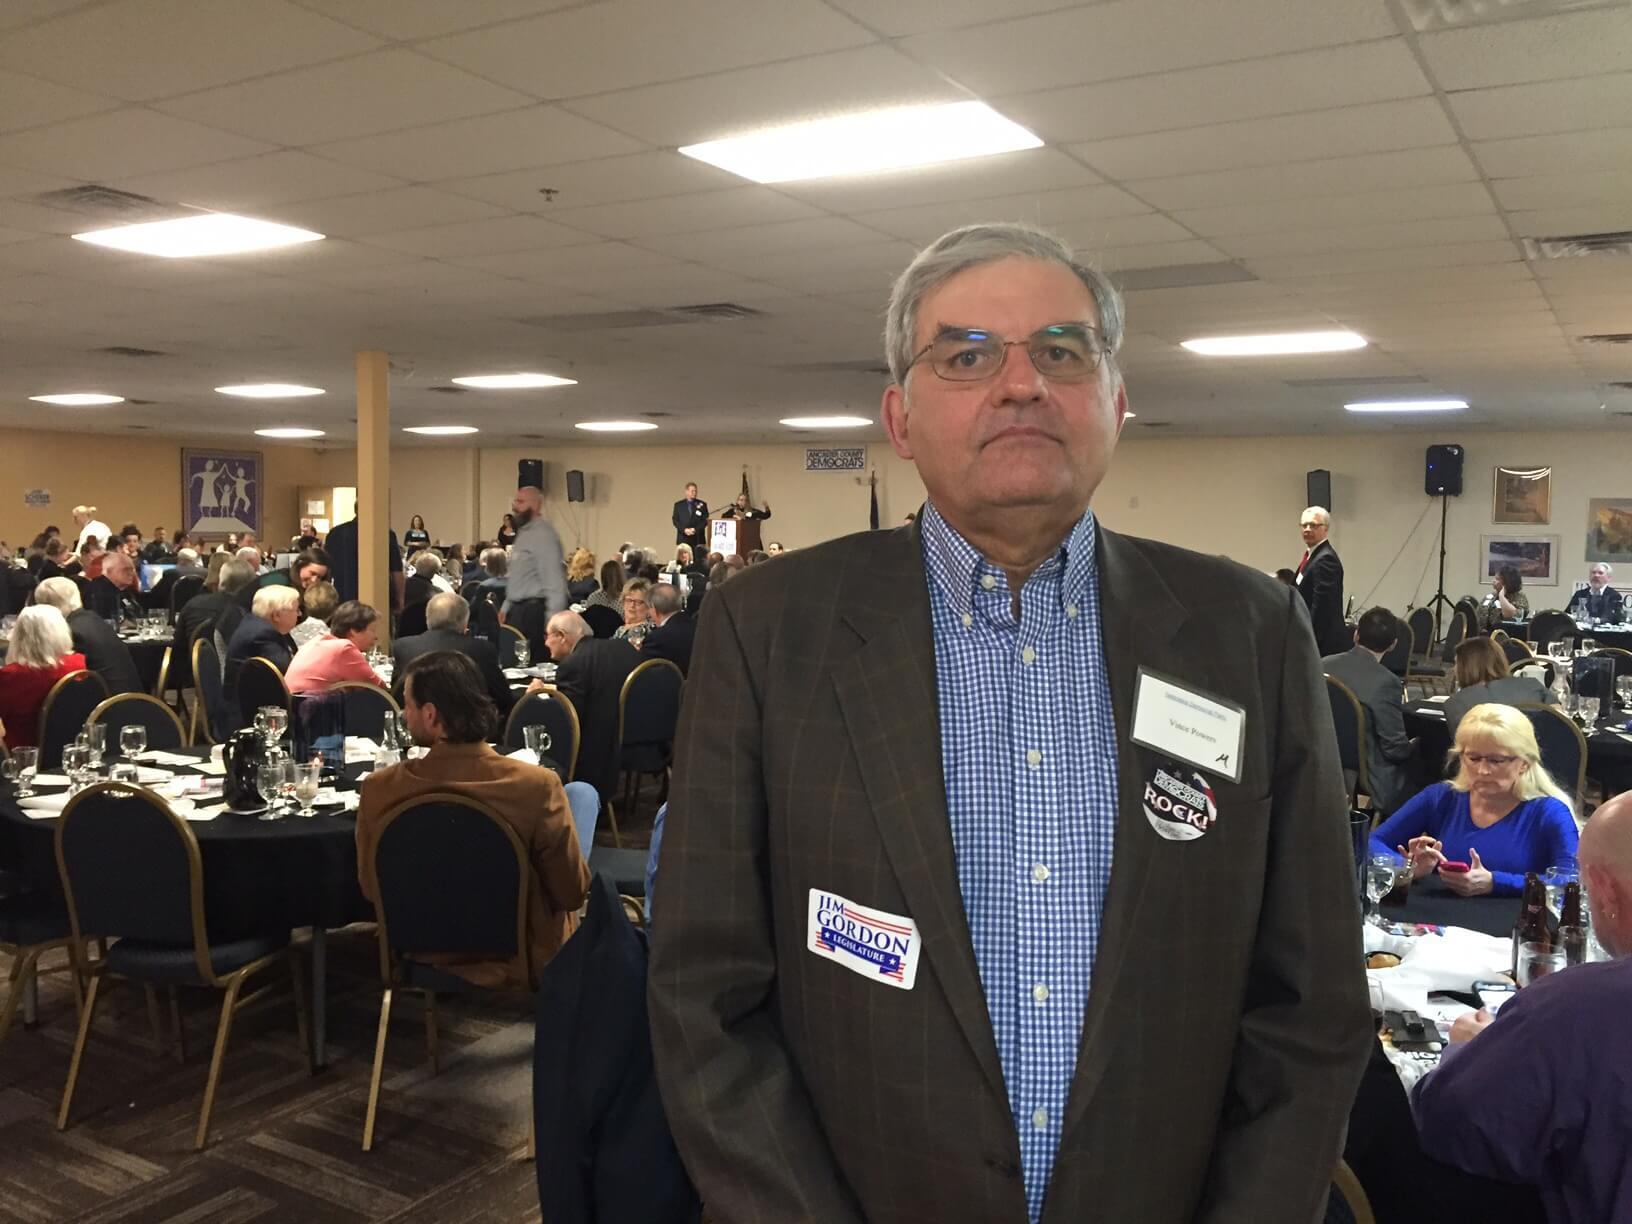 Nebraska Democrats chair Vince Powers